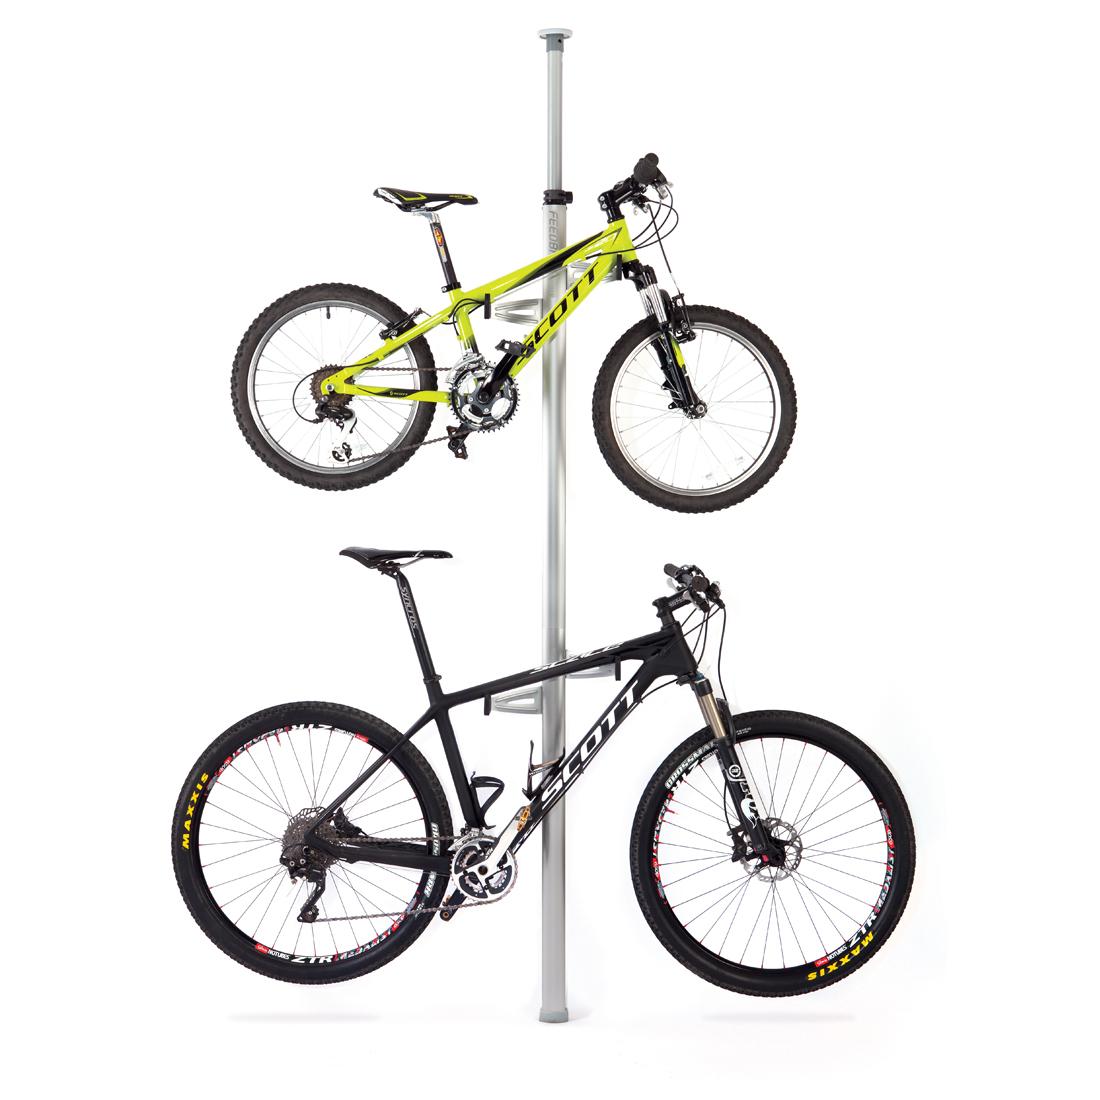 best bike storage solutions 2018 hooks racks and sheds cycling weekly. Black Bedroom Furniture Sets. Home Design Ideas